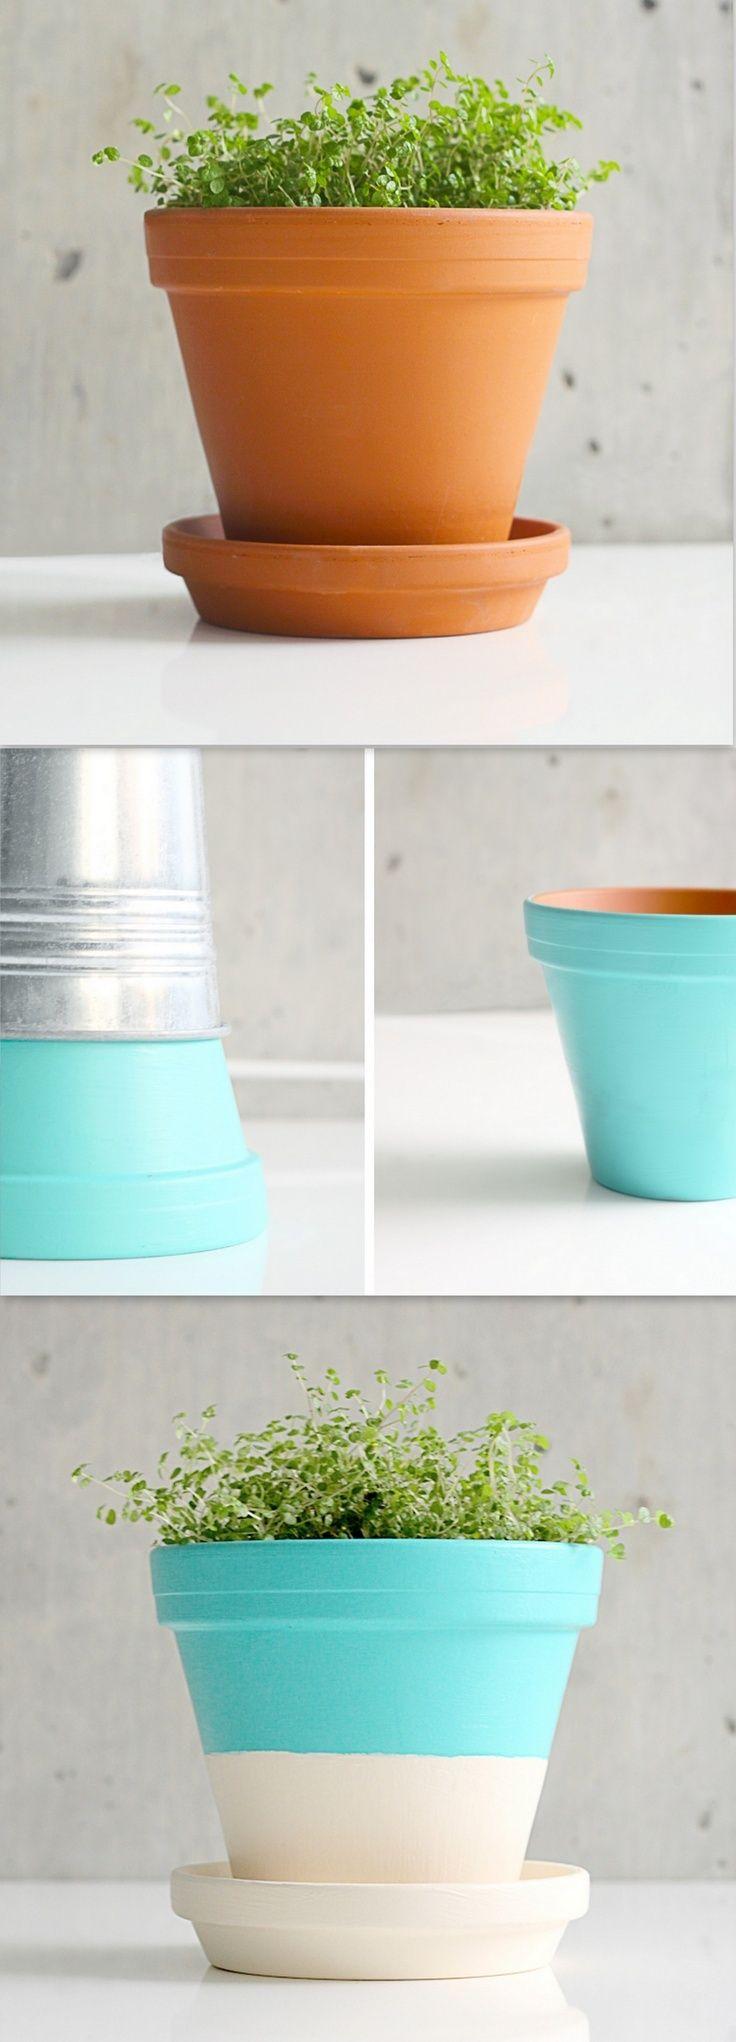 best 25 painting terracotta pots ideas on pinterest. Black Bedroom Furniture Sets. Home Design Ideas